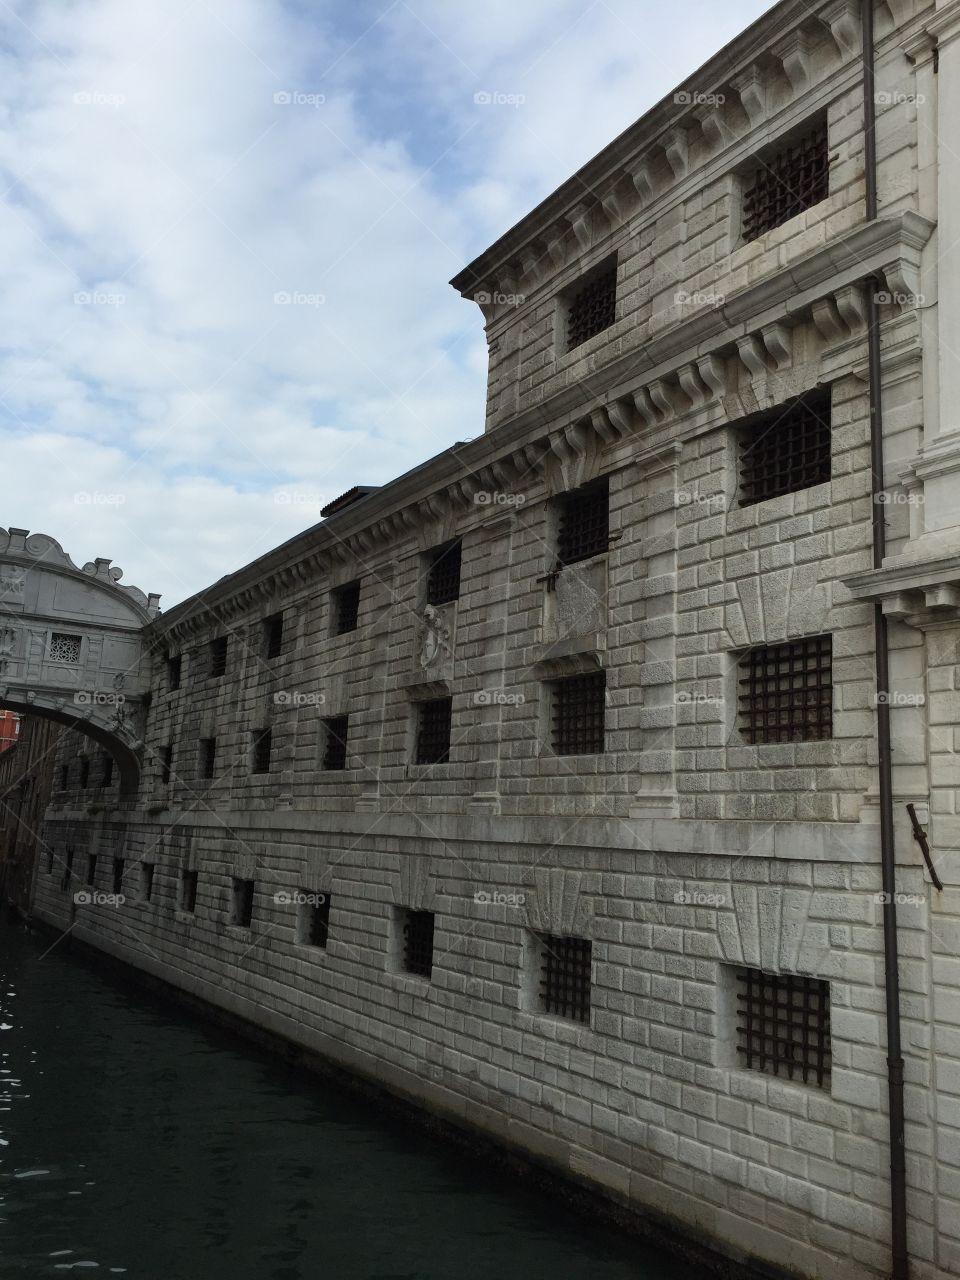 Old Jail House. Venice, Italy